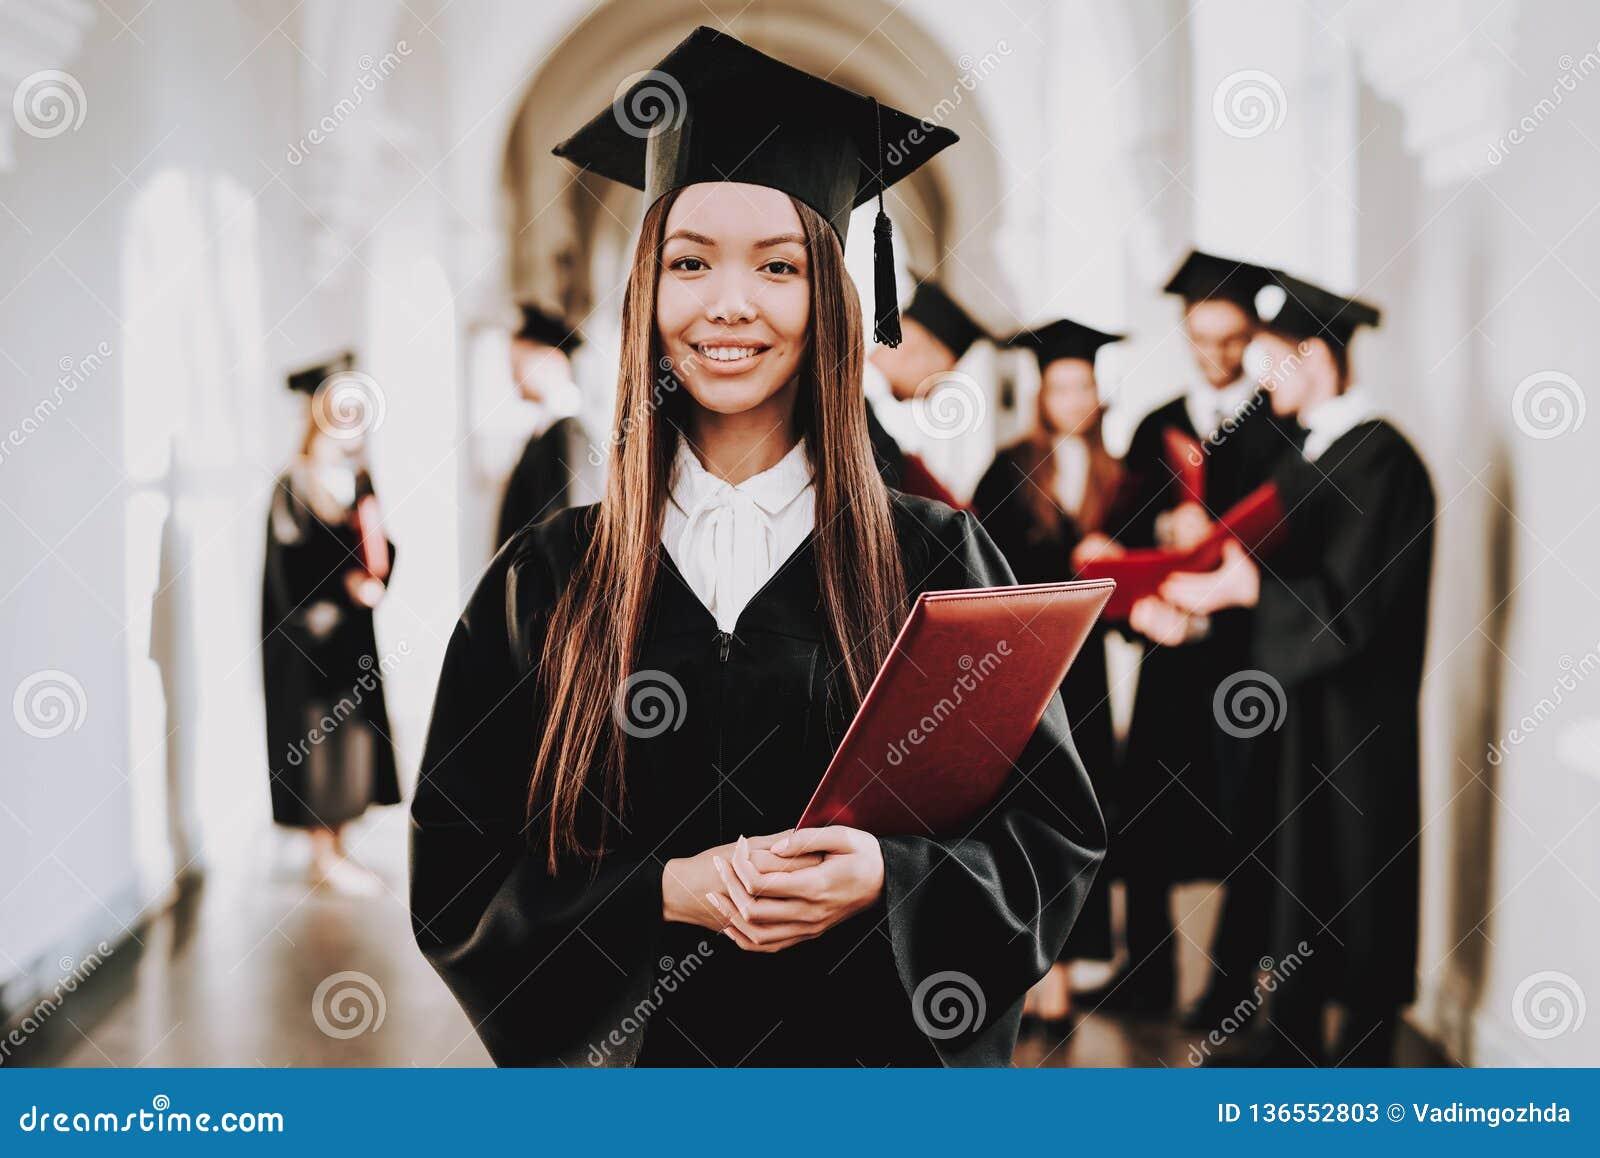 Muchacha asiática standing Pasillo universidad trajes